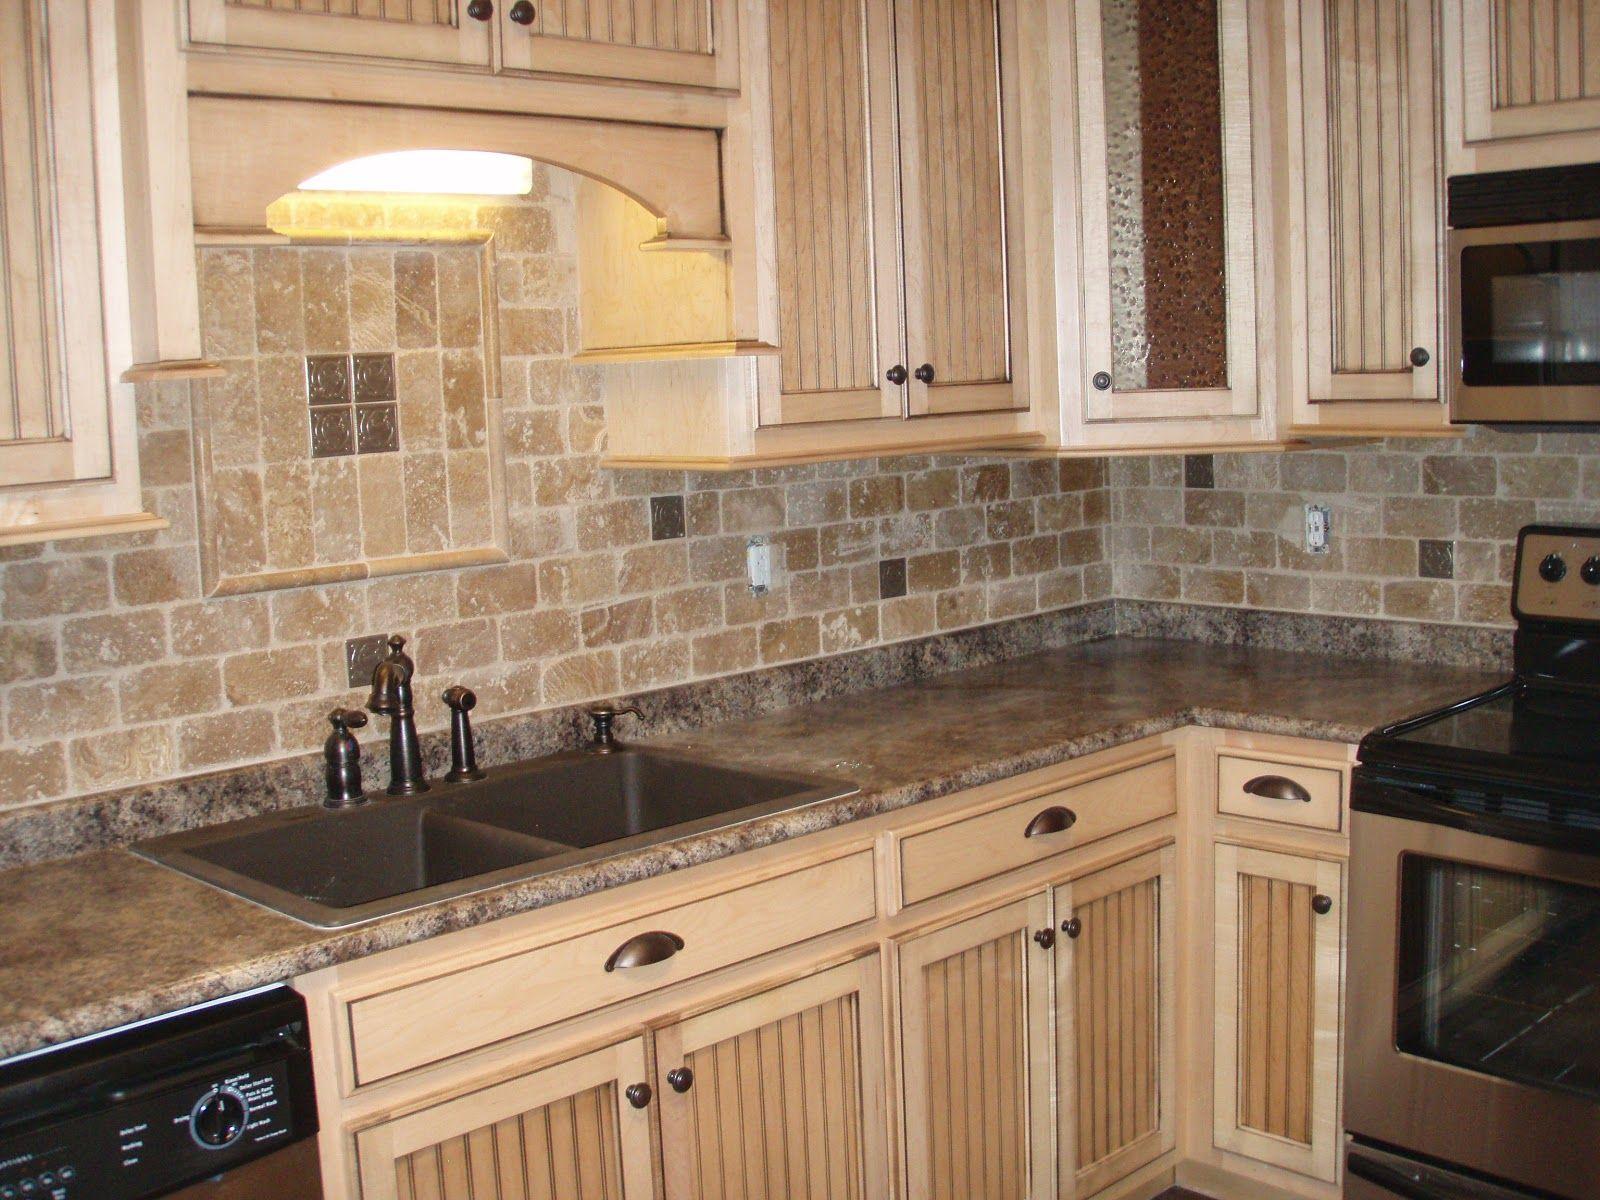 white kitchen cabinets and backsplash crosley cart stone with